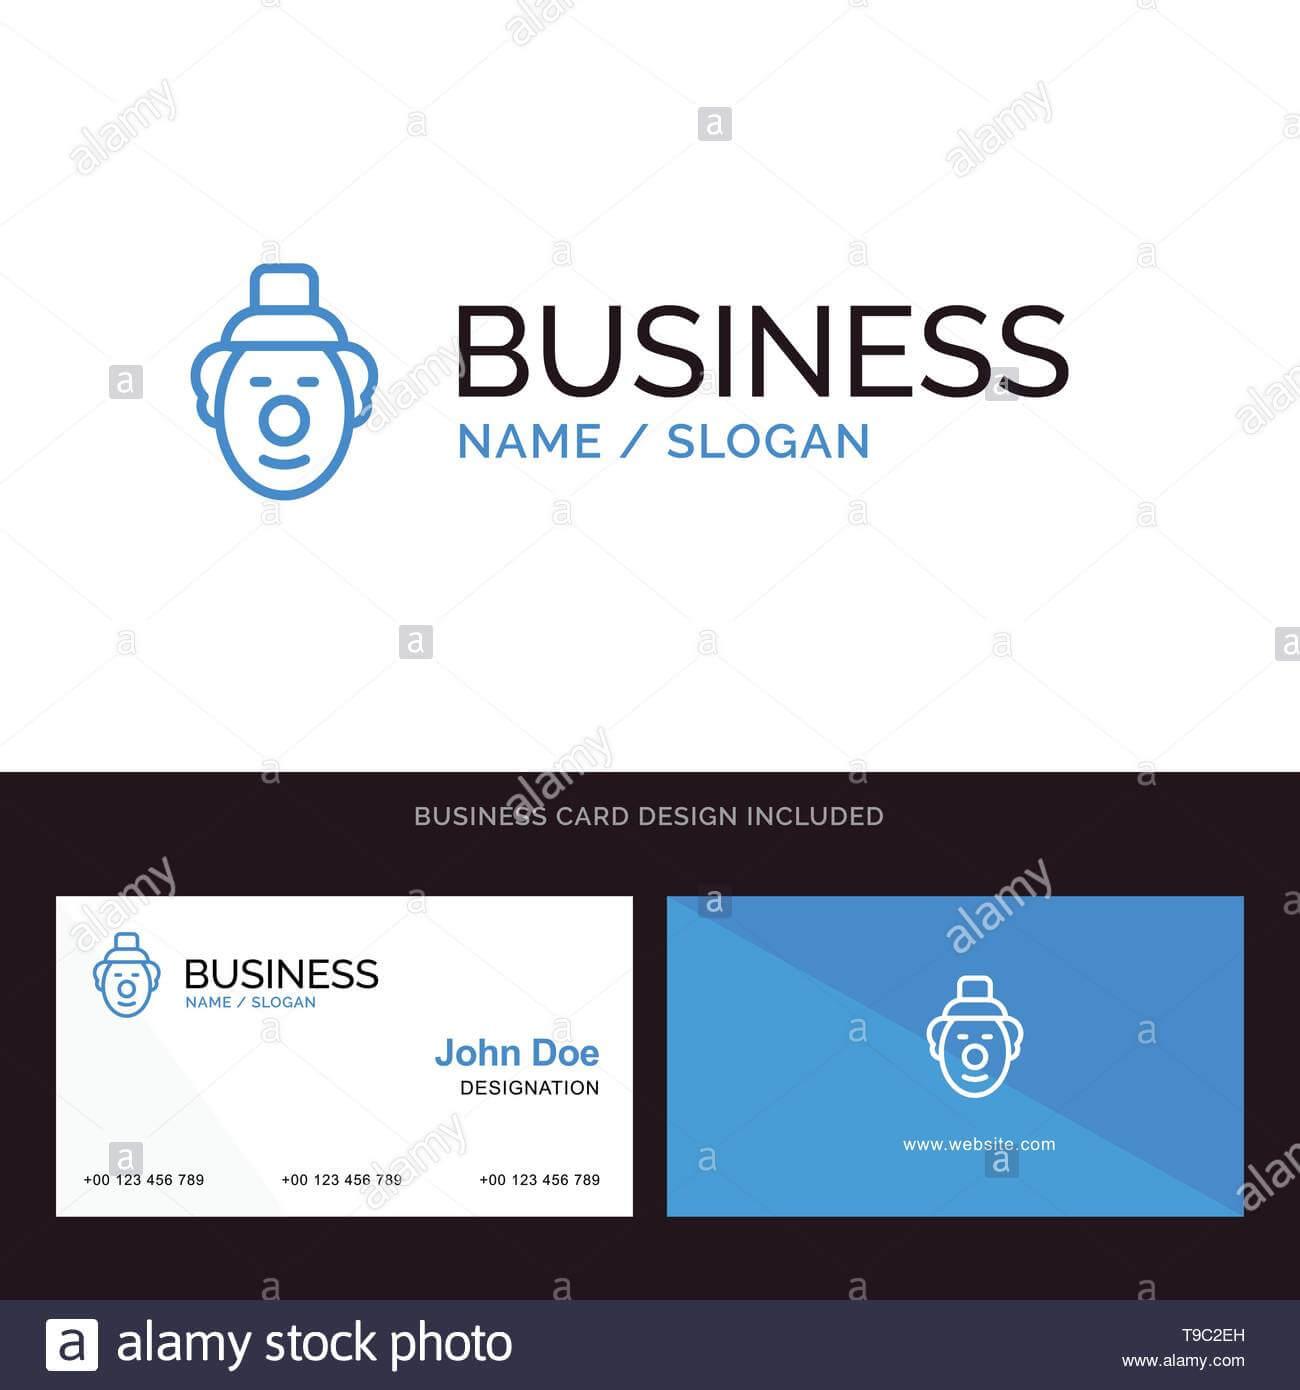 Logo And Business Card Template For Joker, Clown, Circus In Joker Card Template